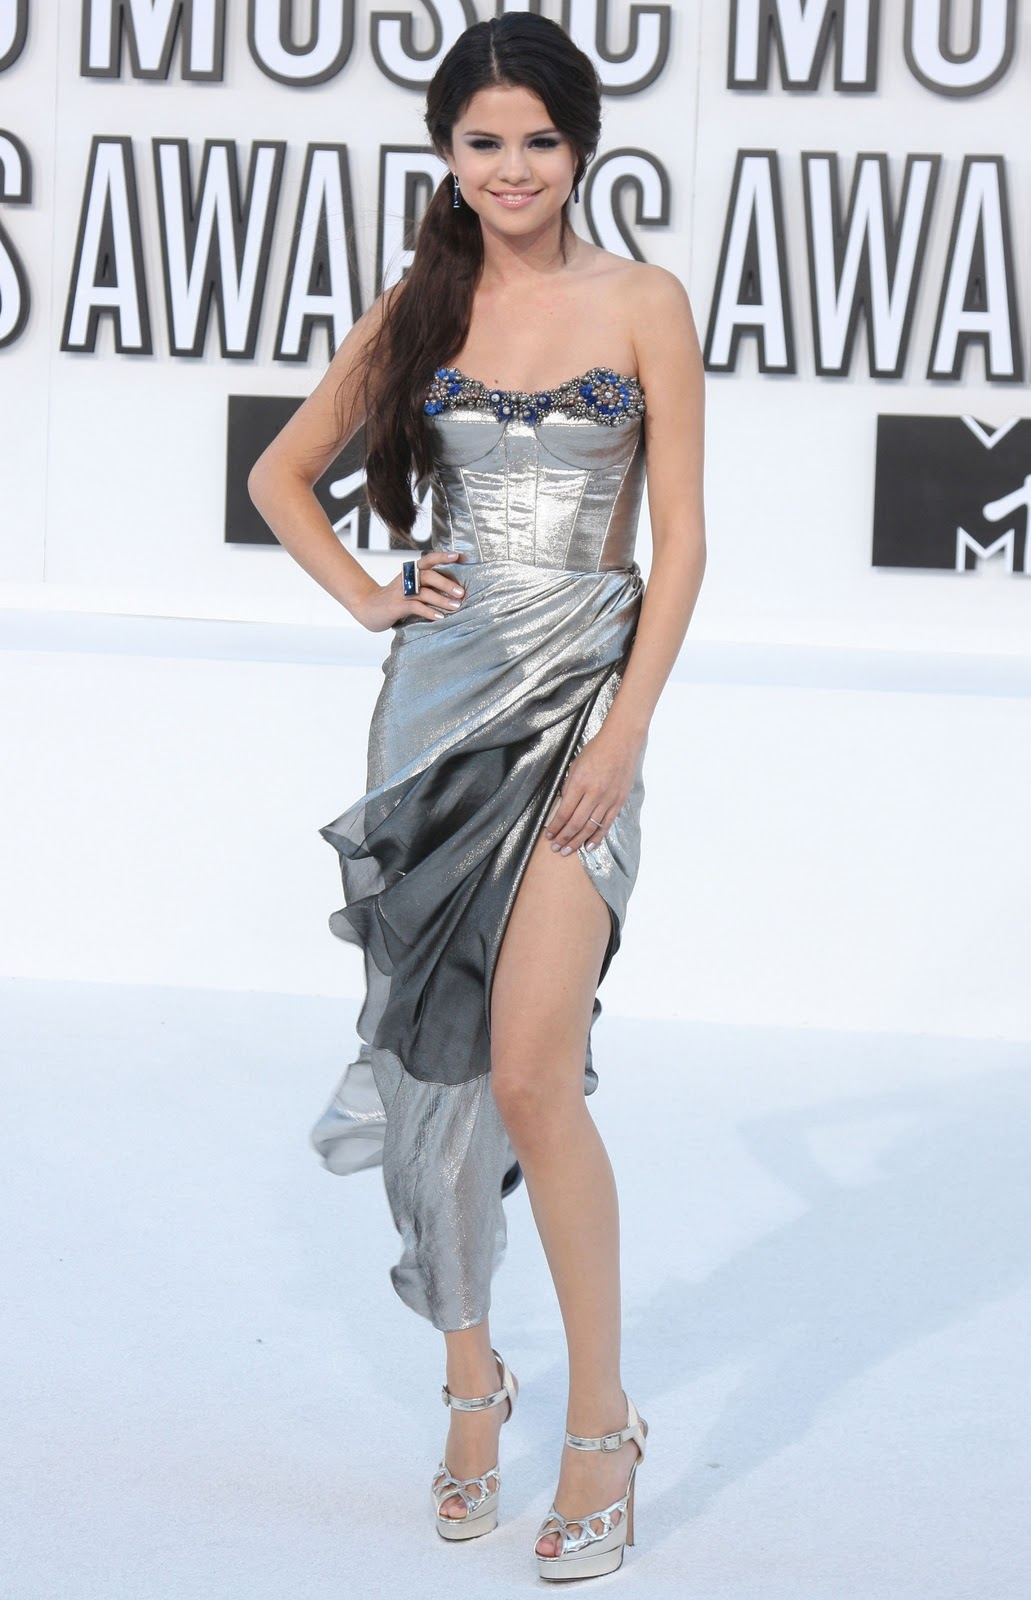 http://3.bp.blogspot.com/_VxSUkzjNTLU/TNK2ZJXHn_I/AAAAAAAASrI/kMdbs-2xtaA/s1600/Selena-Gomez-at-2010-Mtv-music-awards.jpg